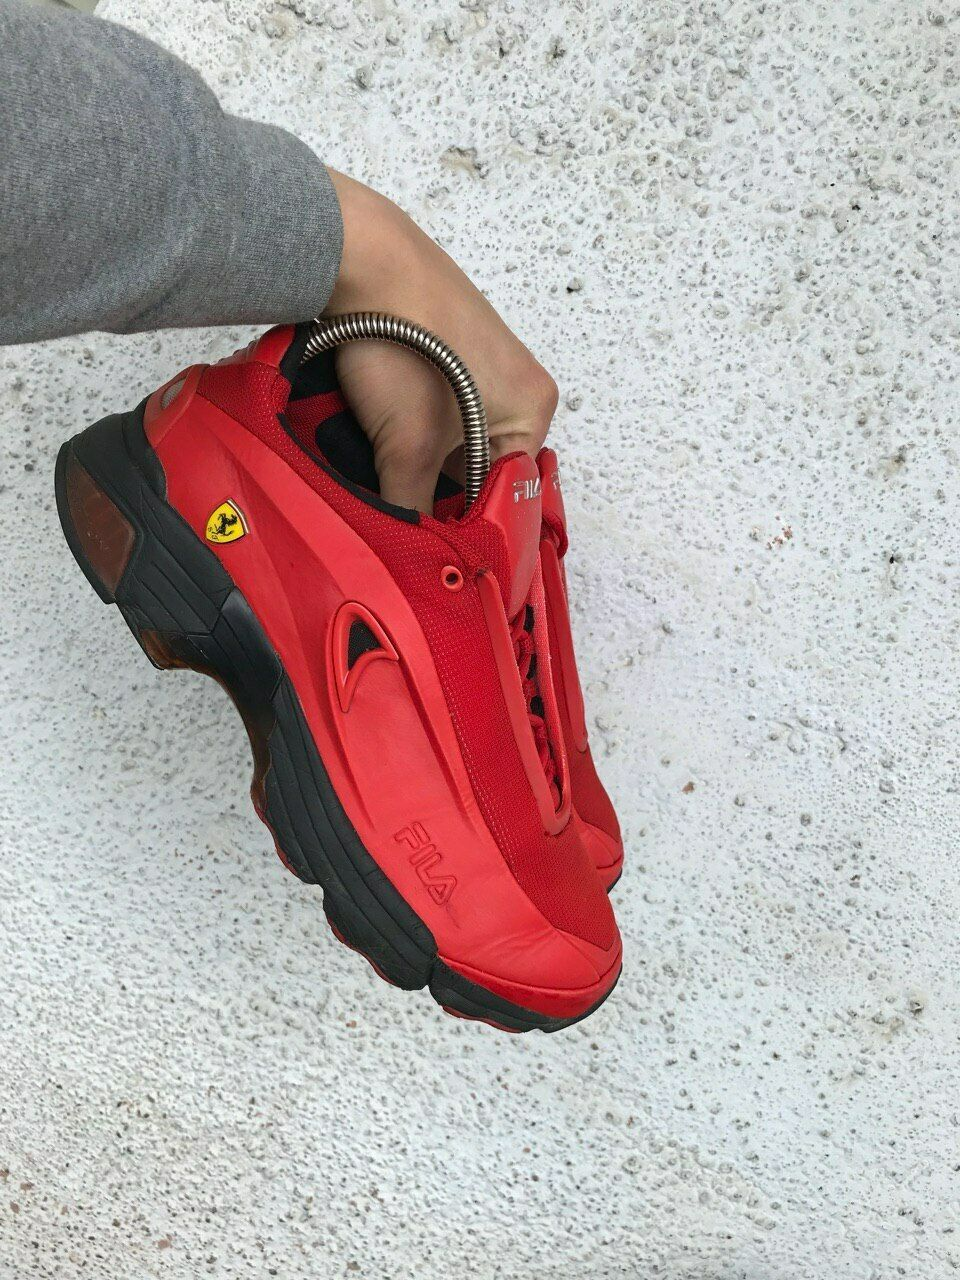 Fila Ferrari F2003 Red original Shoes